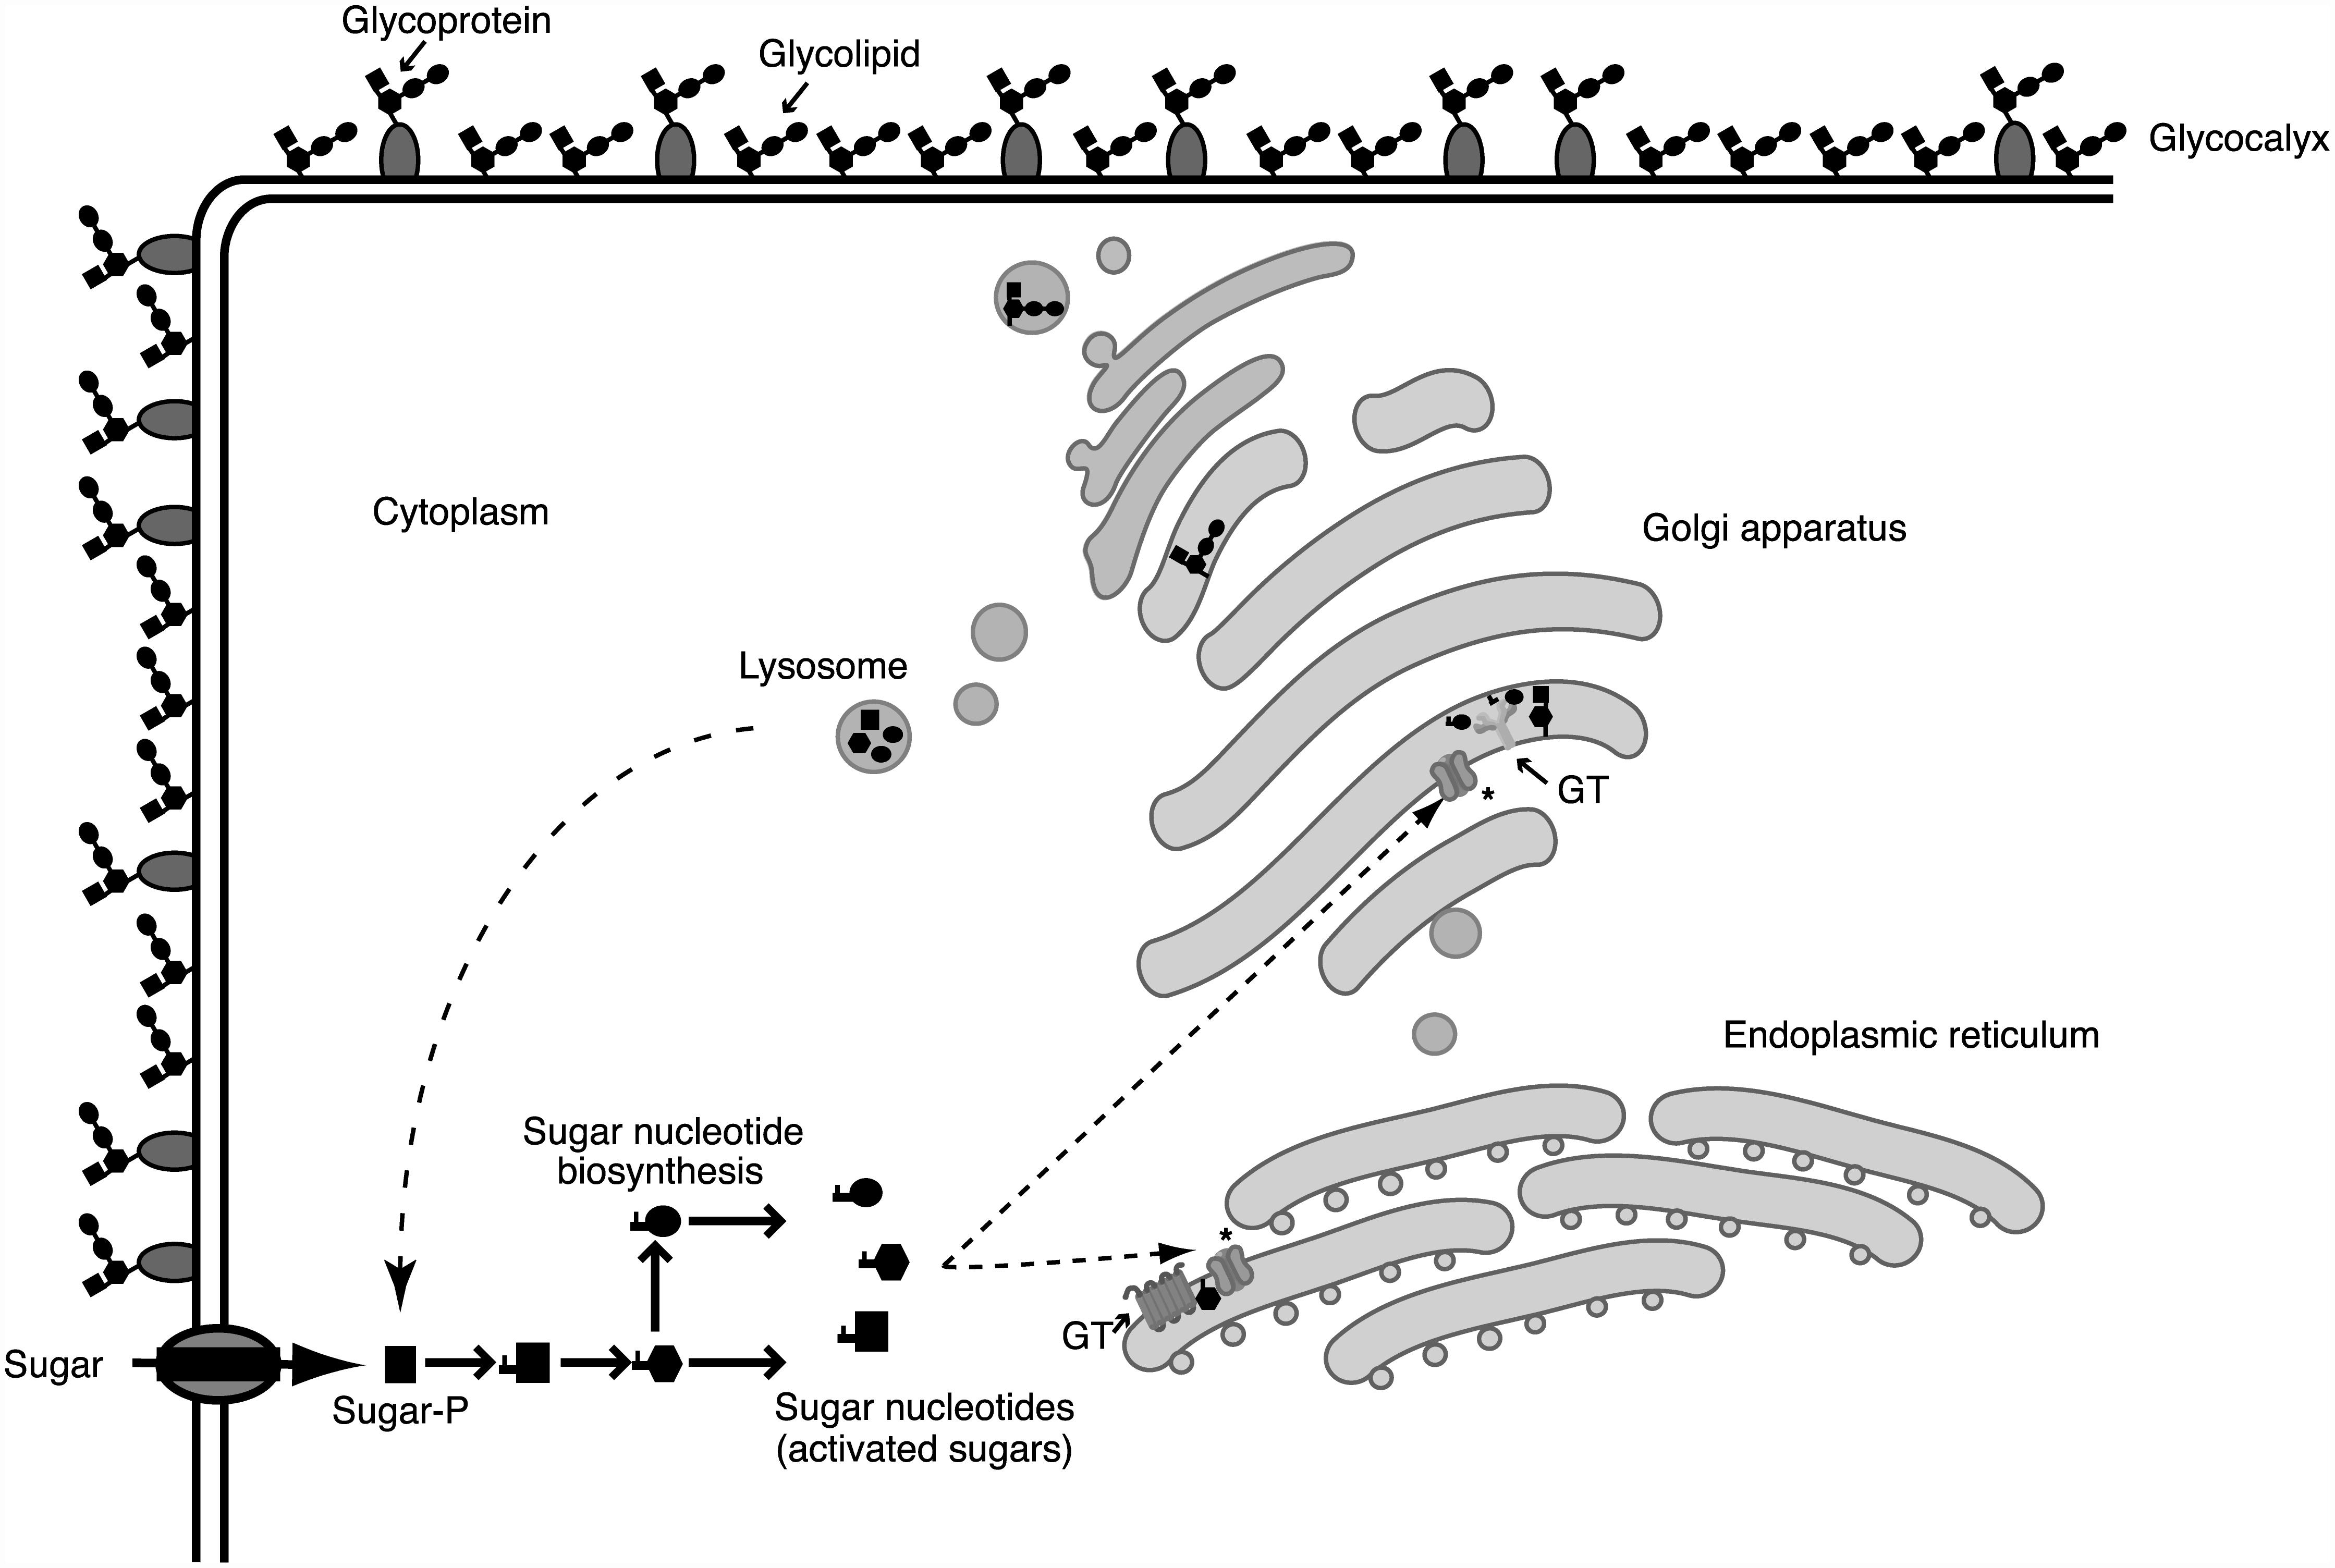 Glycosylation processes involve different cellular compartments.